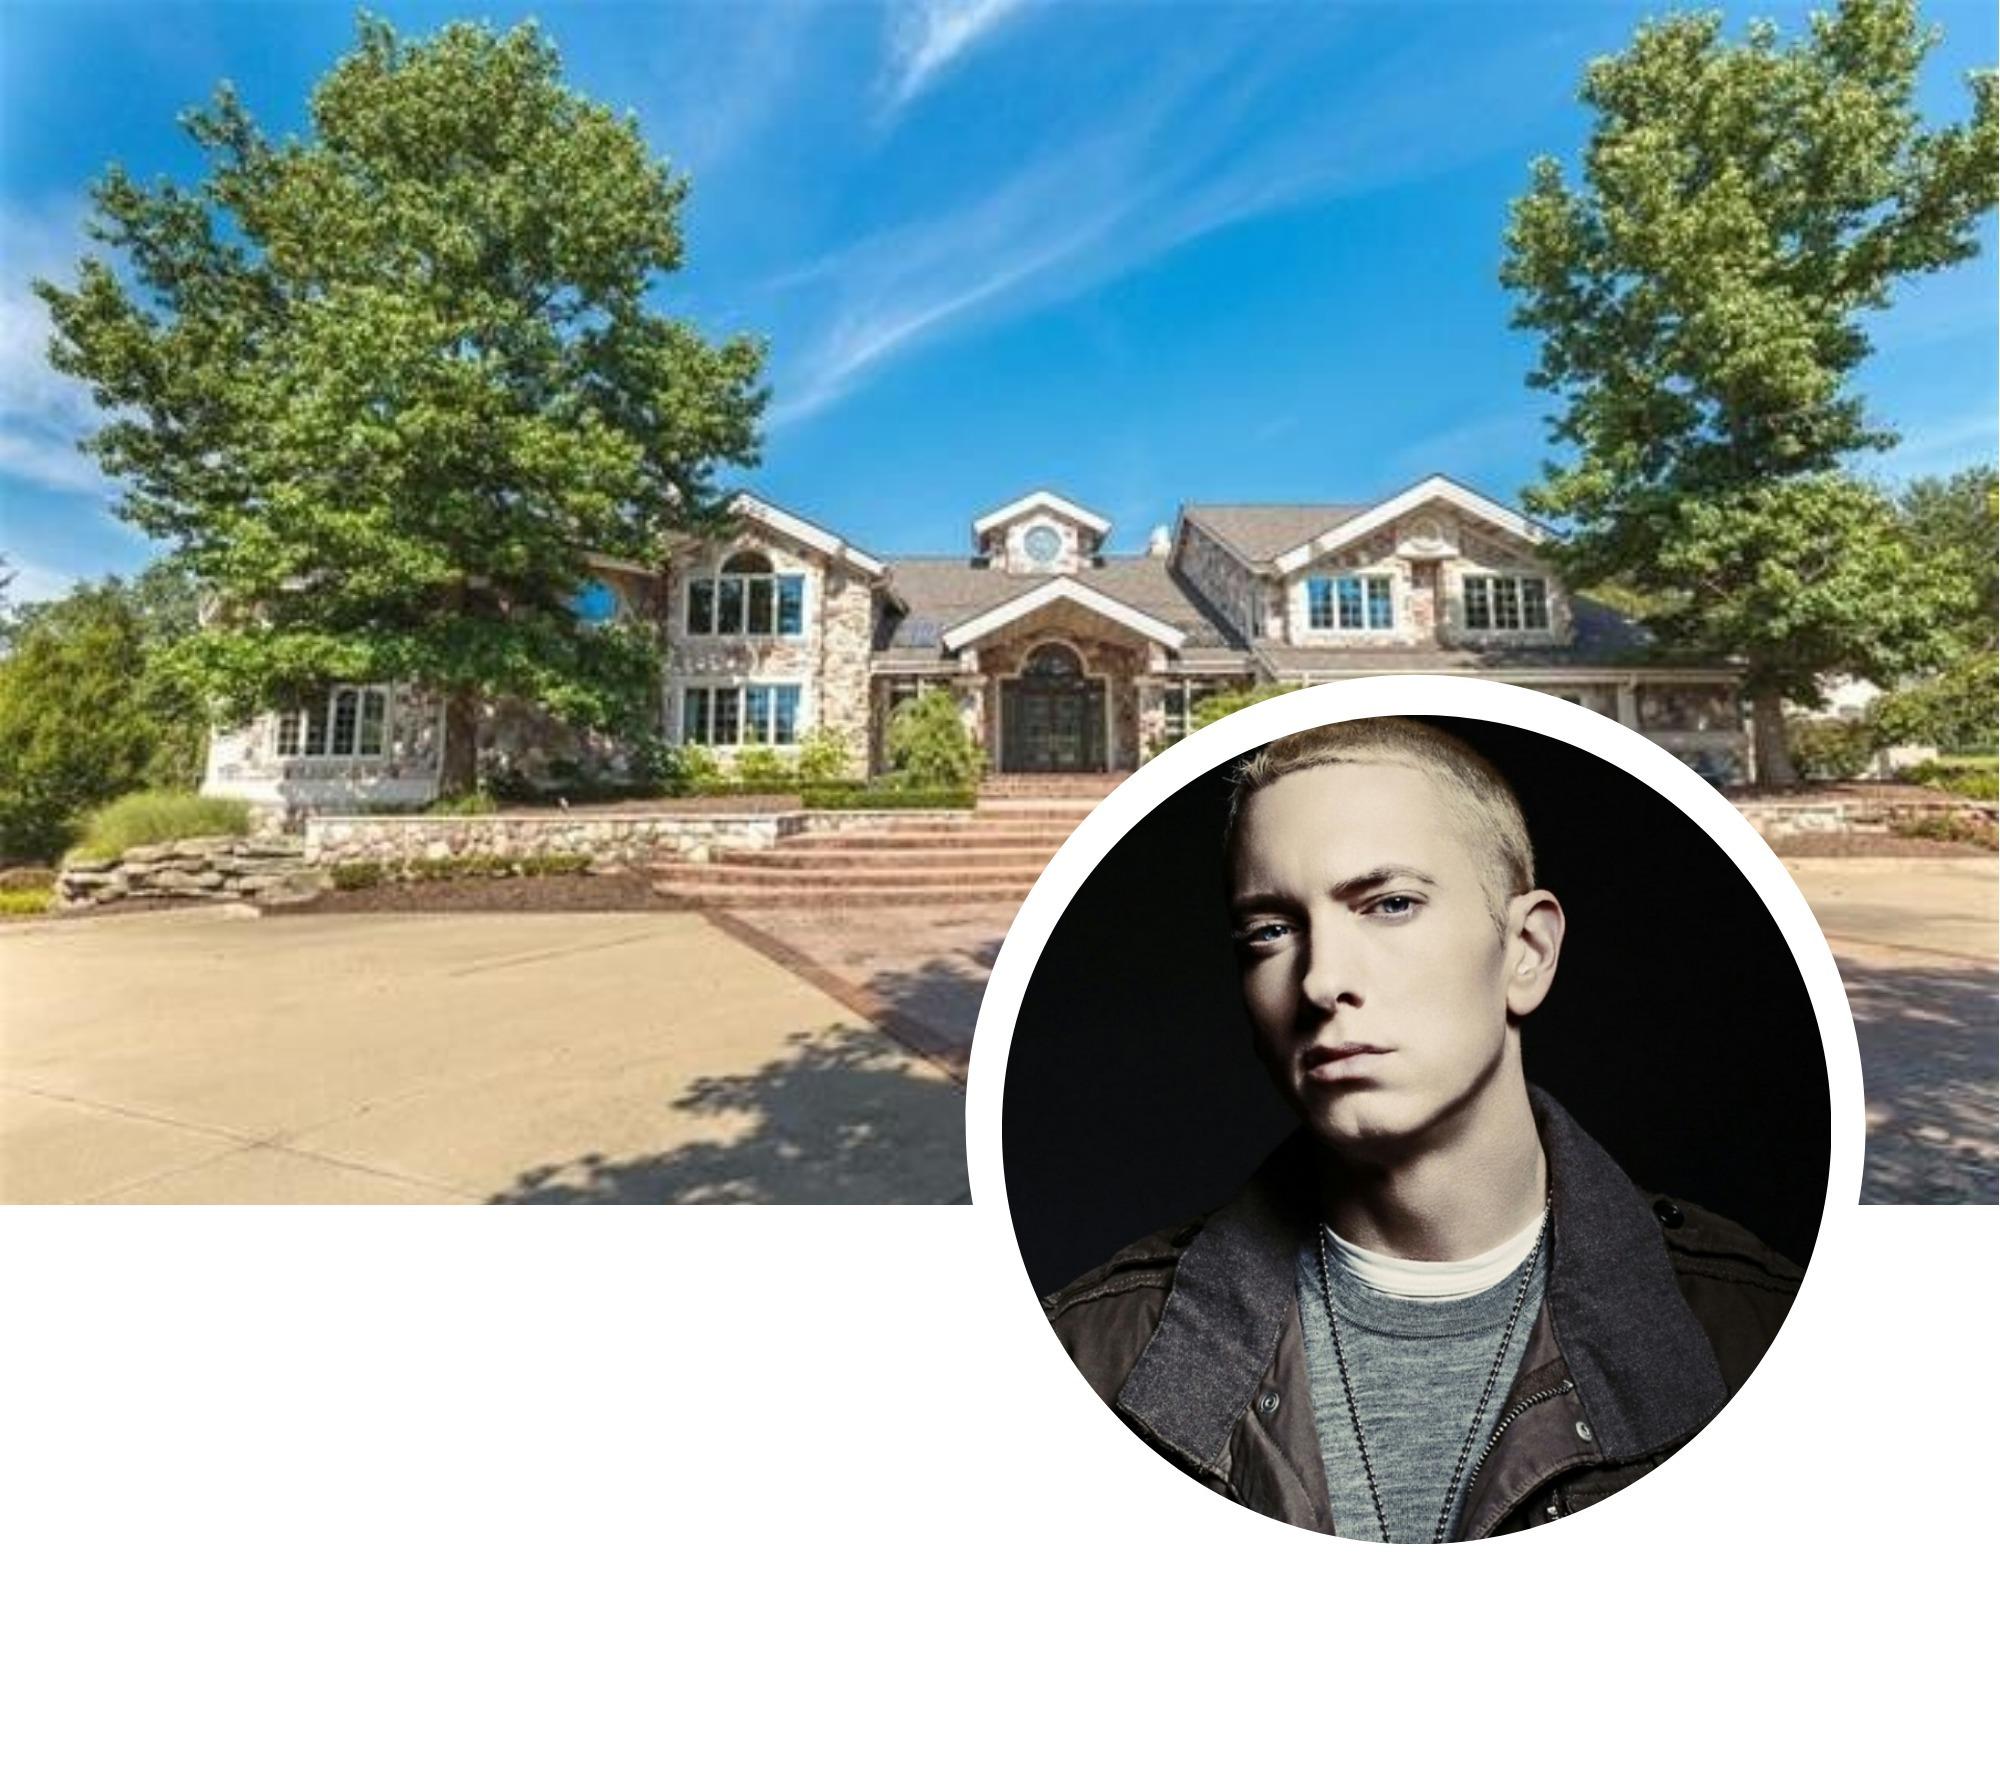 Eminem mette in vendita la propria casa